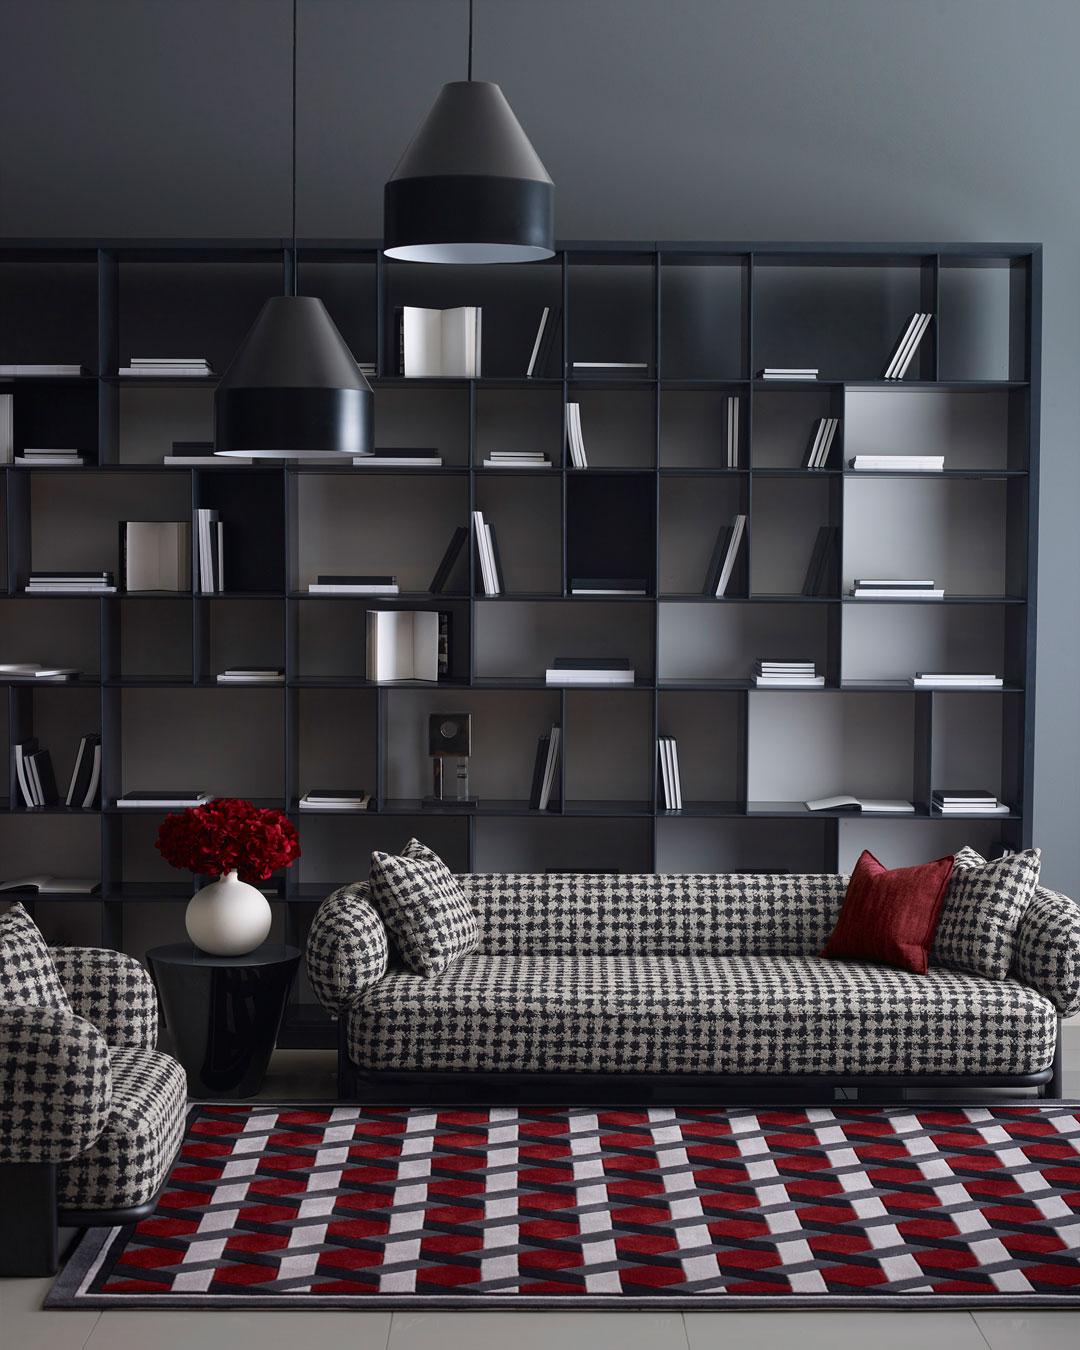 location living room shot of siena rug by greg natale